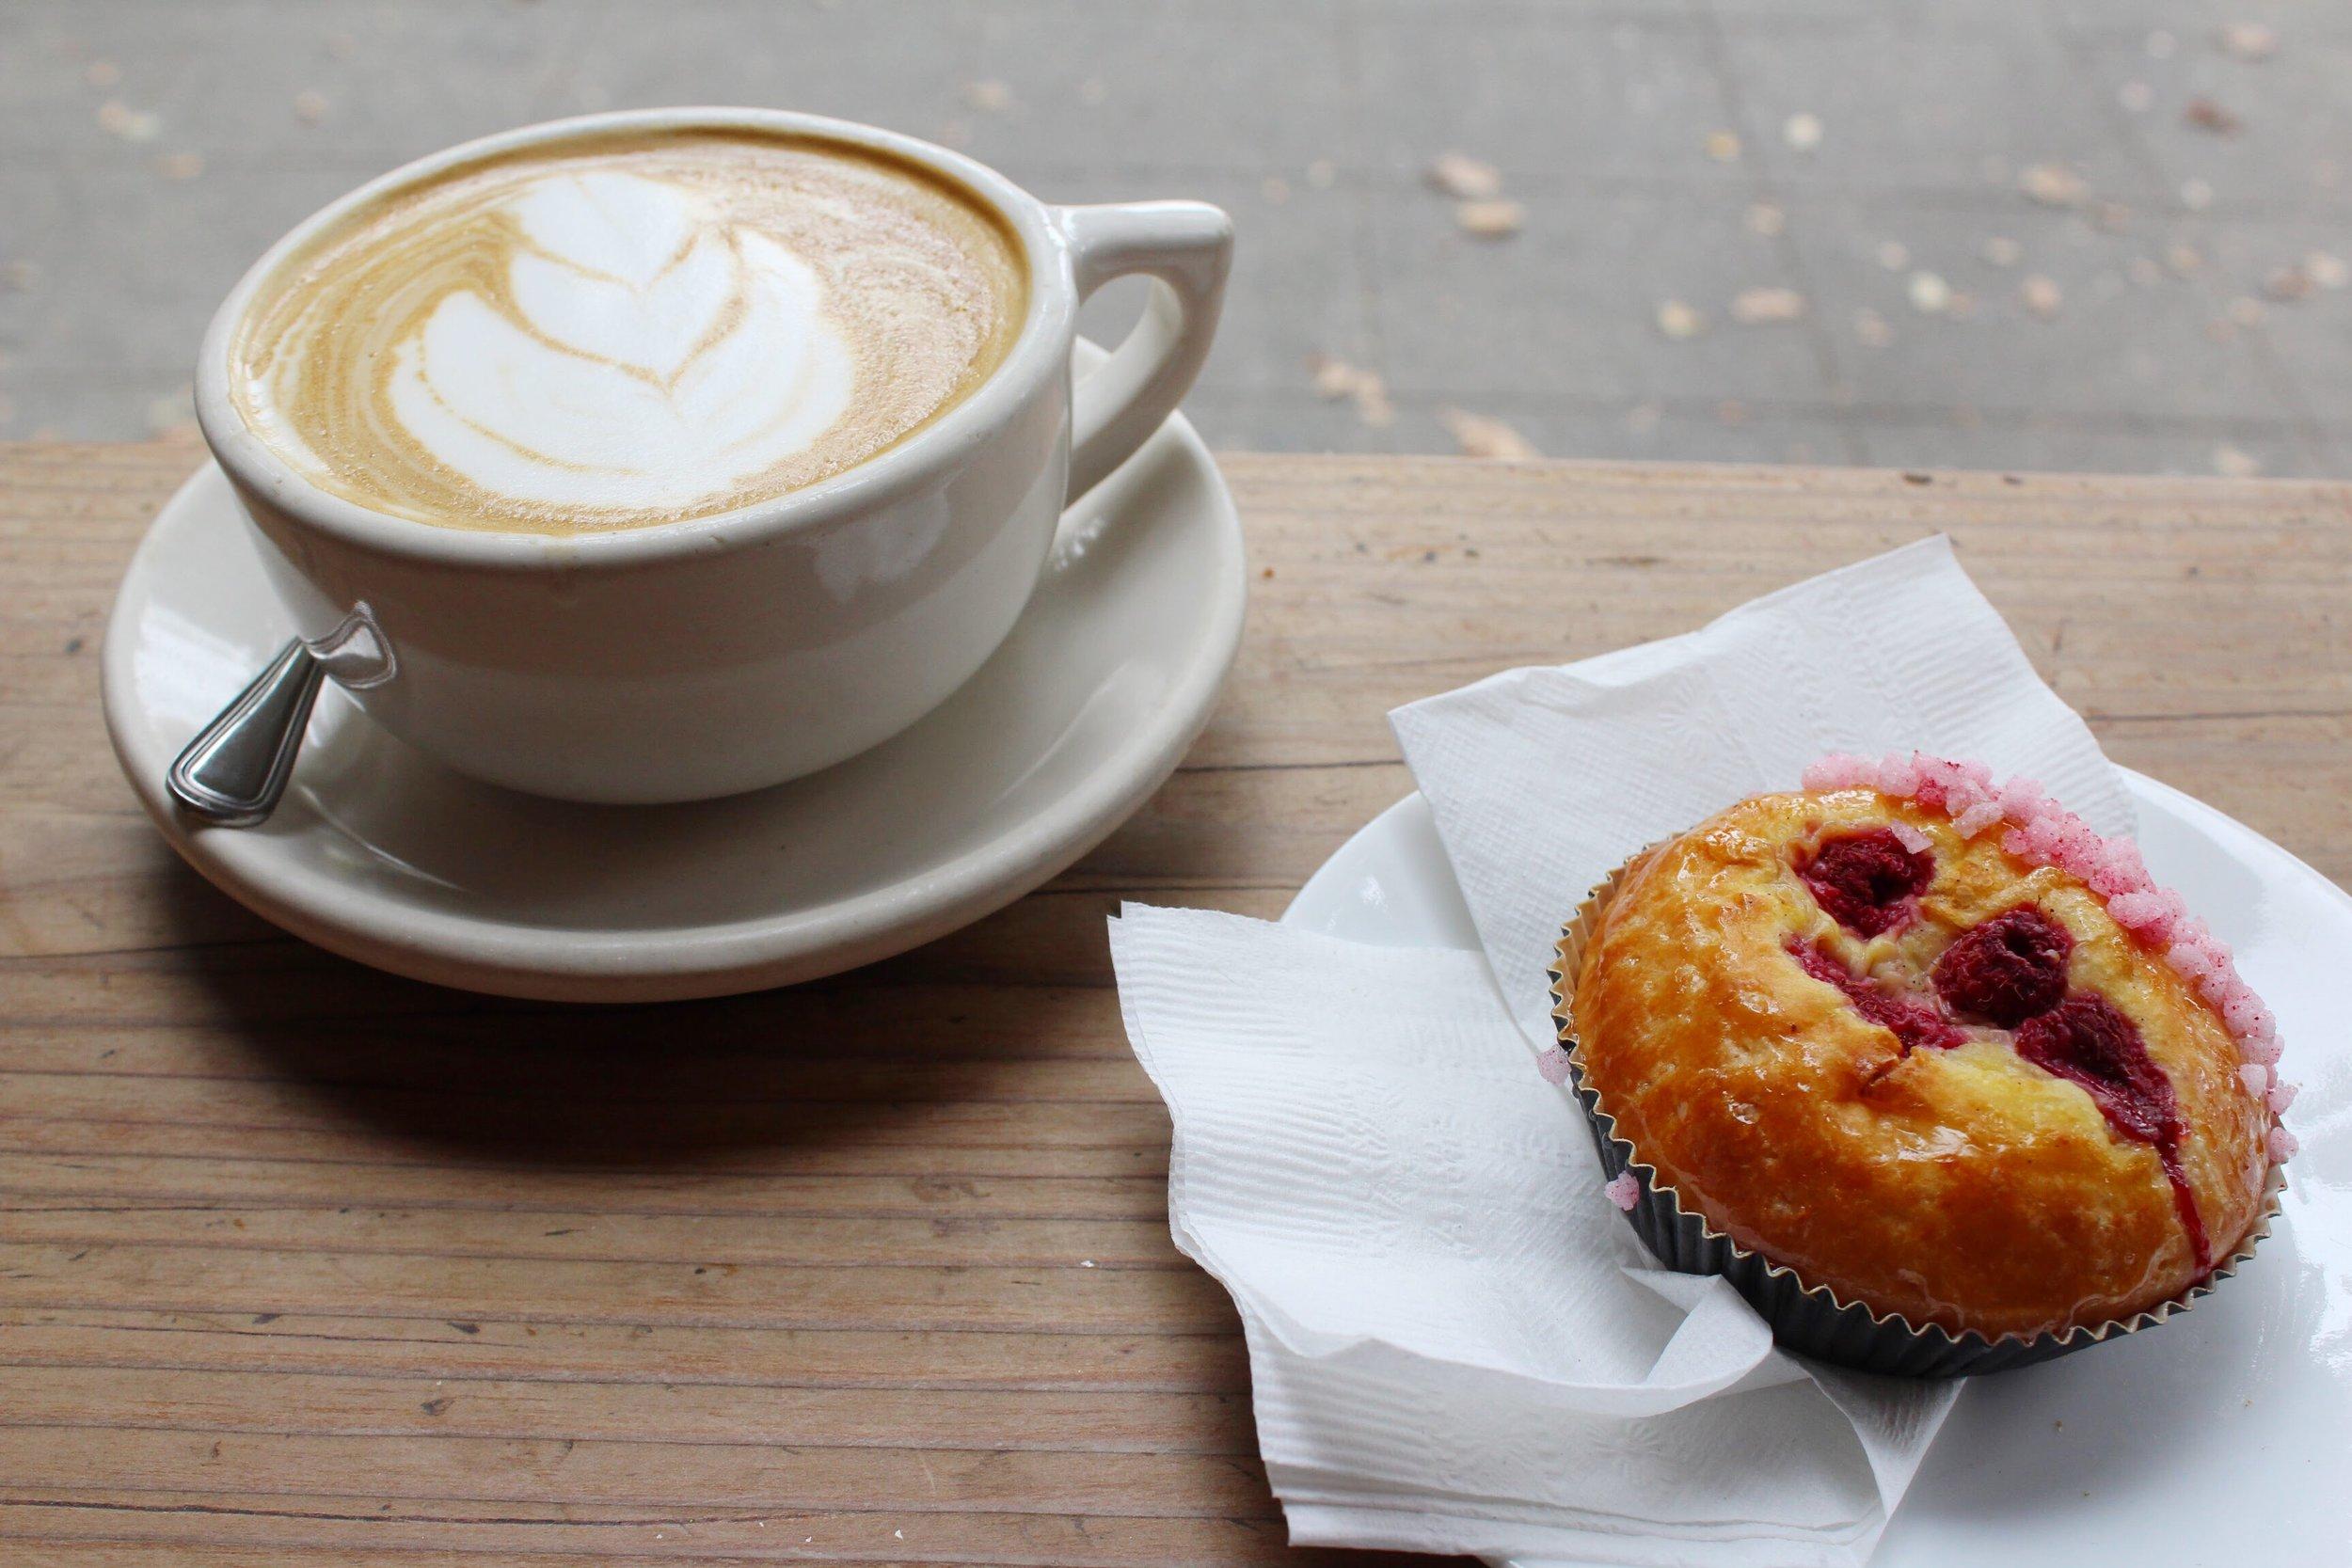 Raspberry Brioche and Latte from Verve Coffee Roasters in Santa Cruz